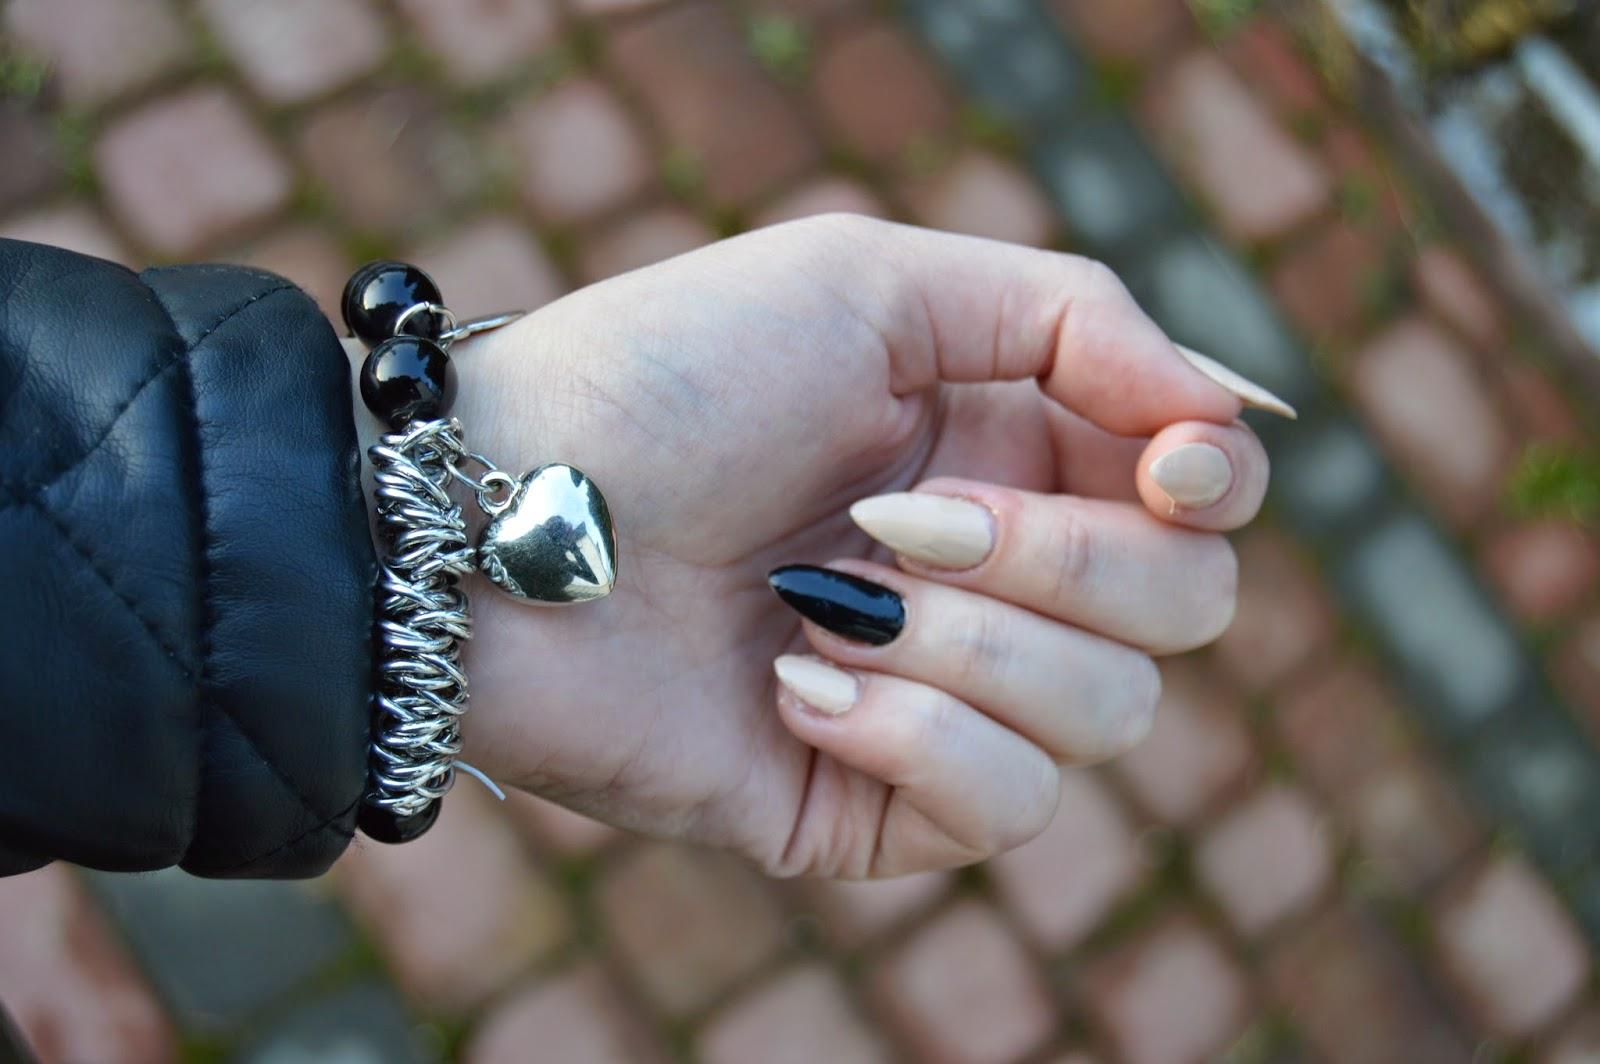 http://www.bornprettystore.com/mixed-metal-beads-pearl-bracelet-black-love-peach-heart-elastic-gold-bracelet-p-7237.html